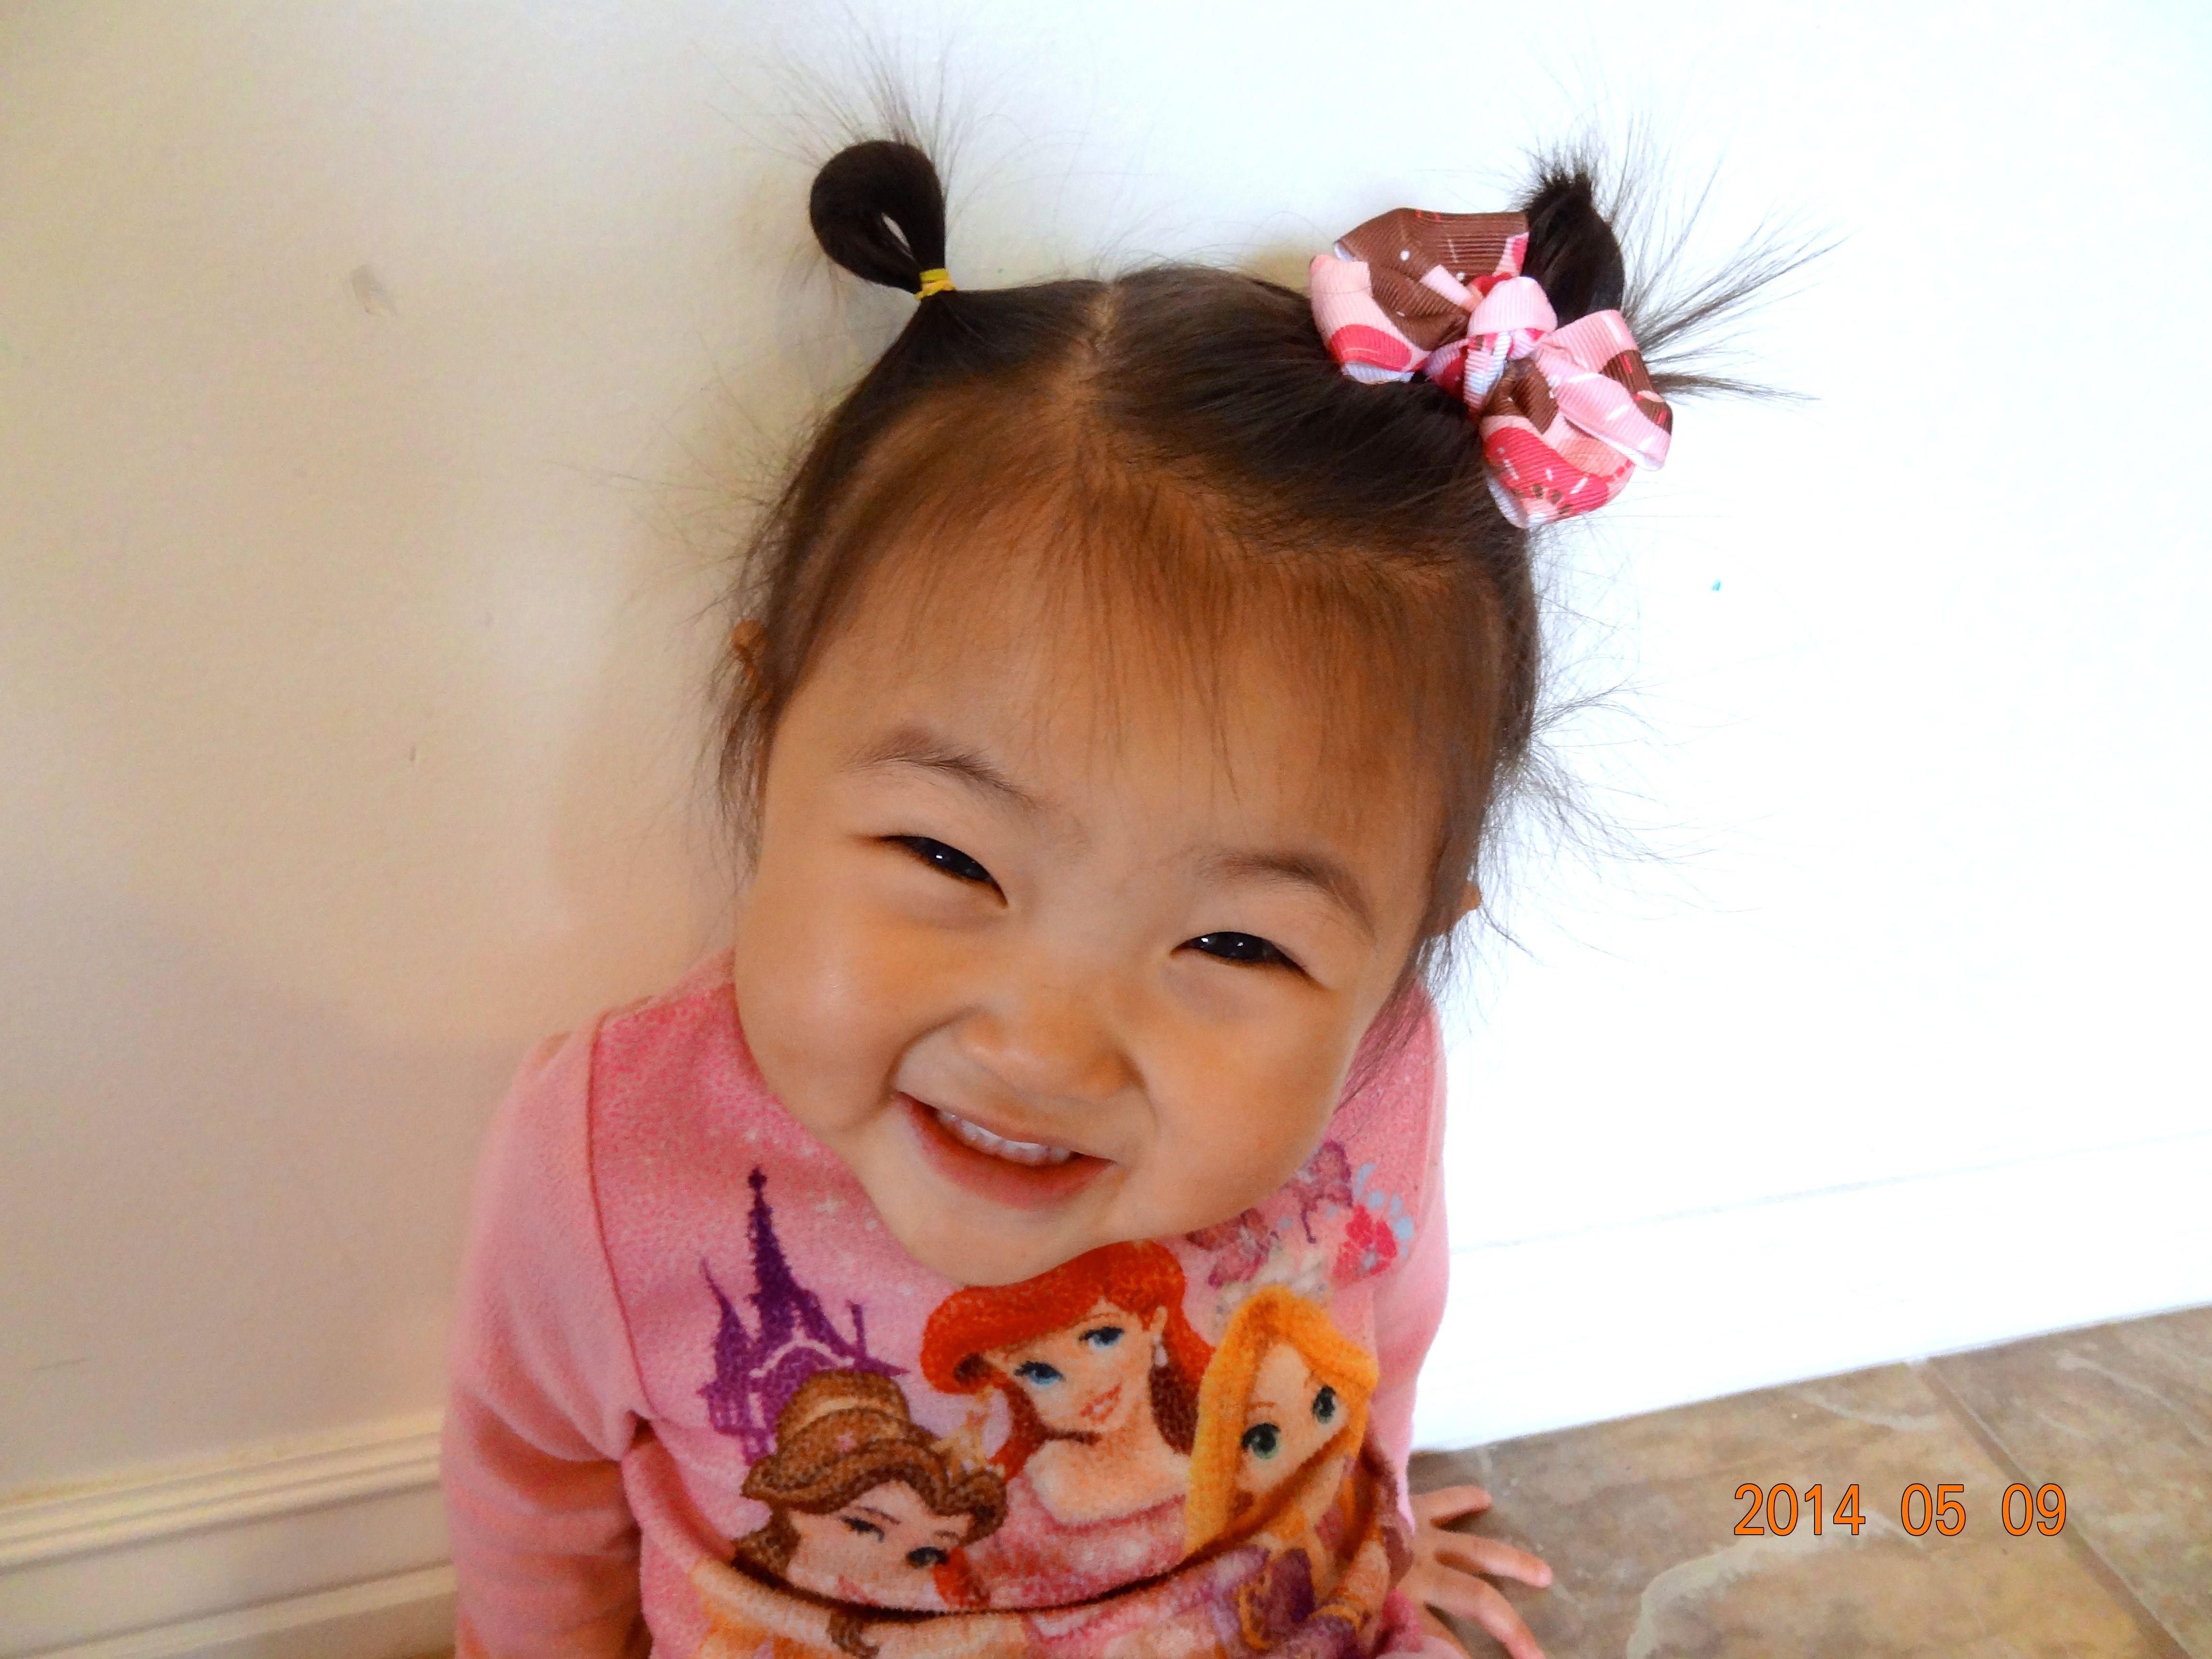 My littel girl with a cute hair bow cute fotos pinterest hair bow